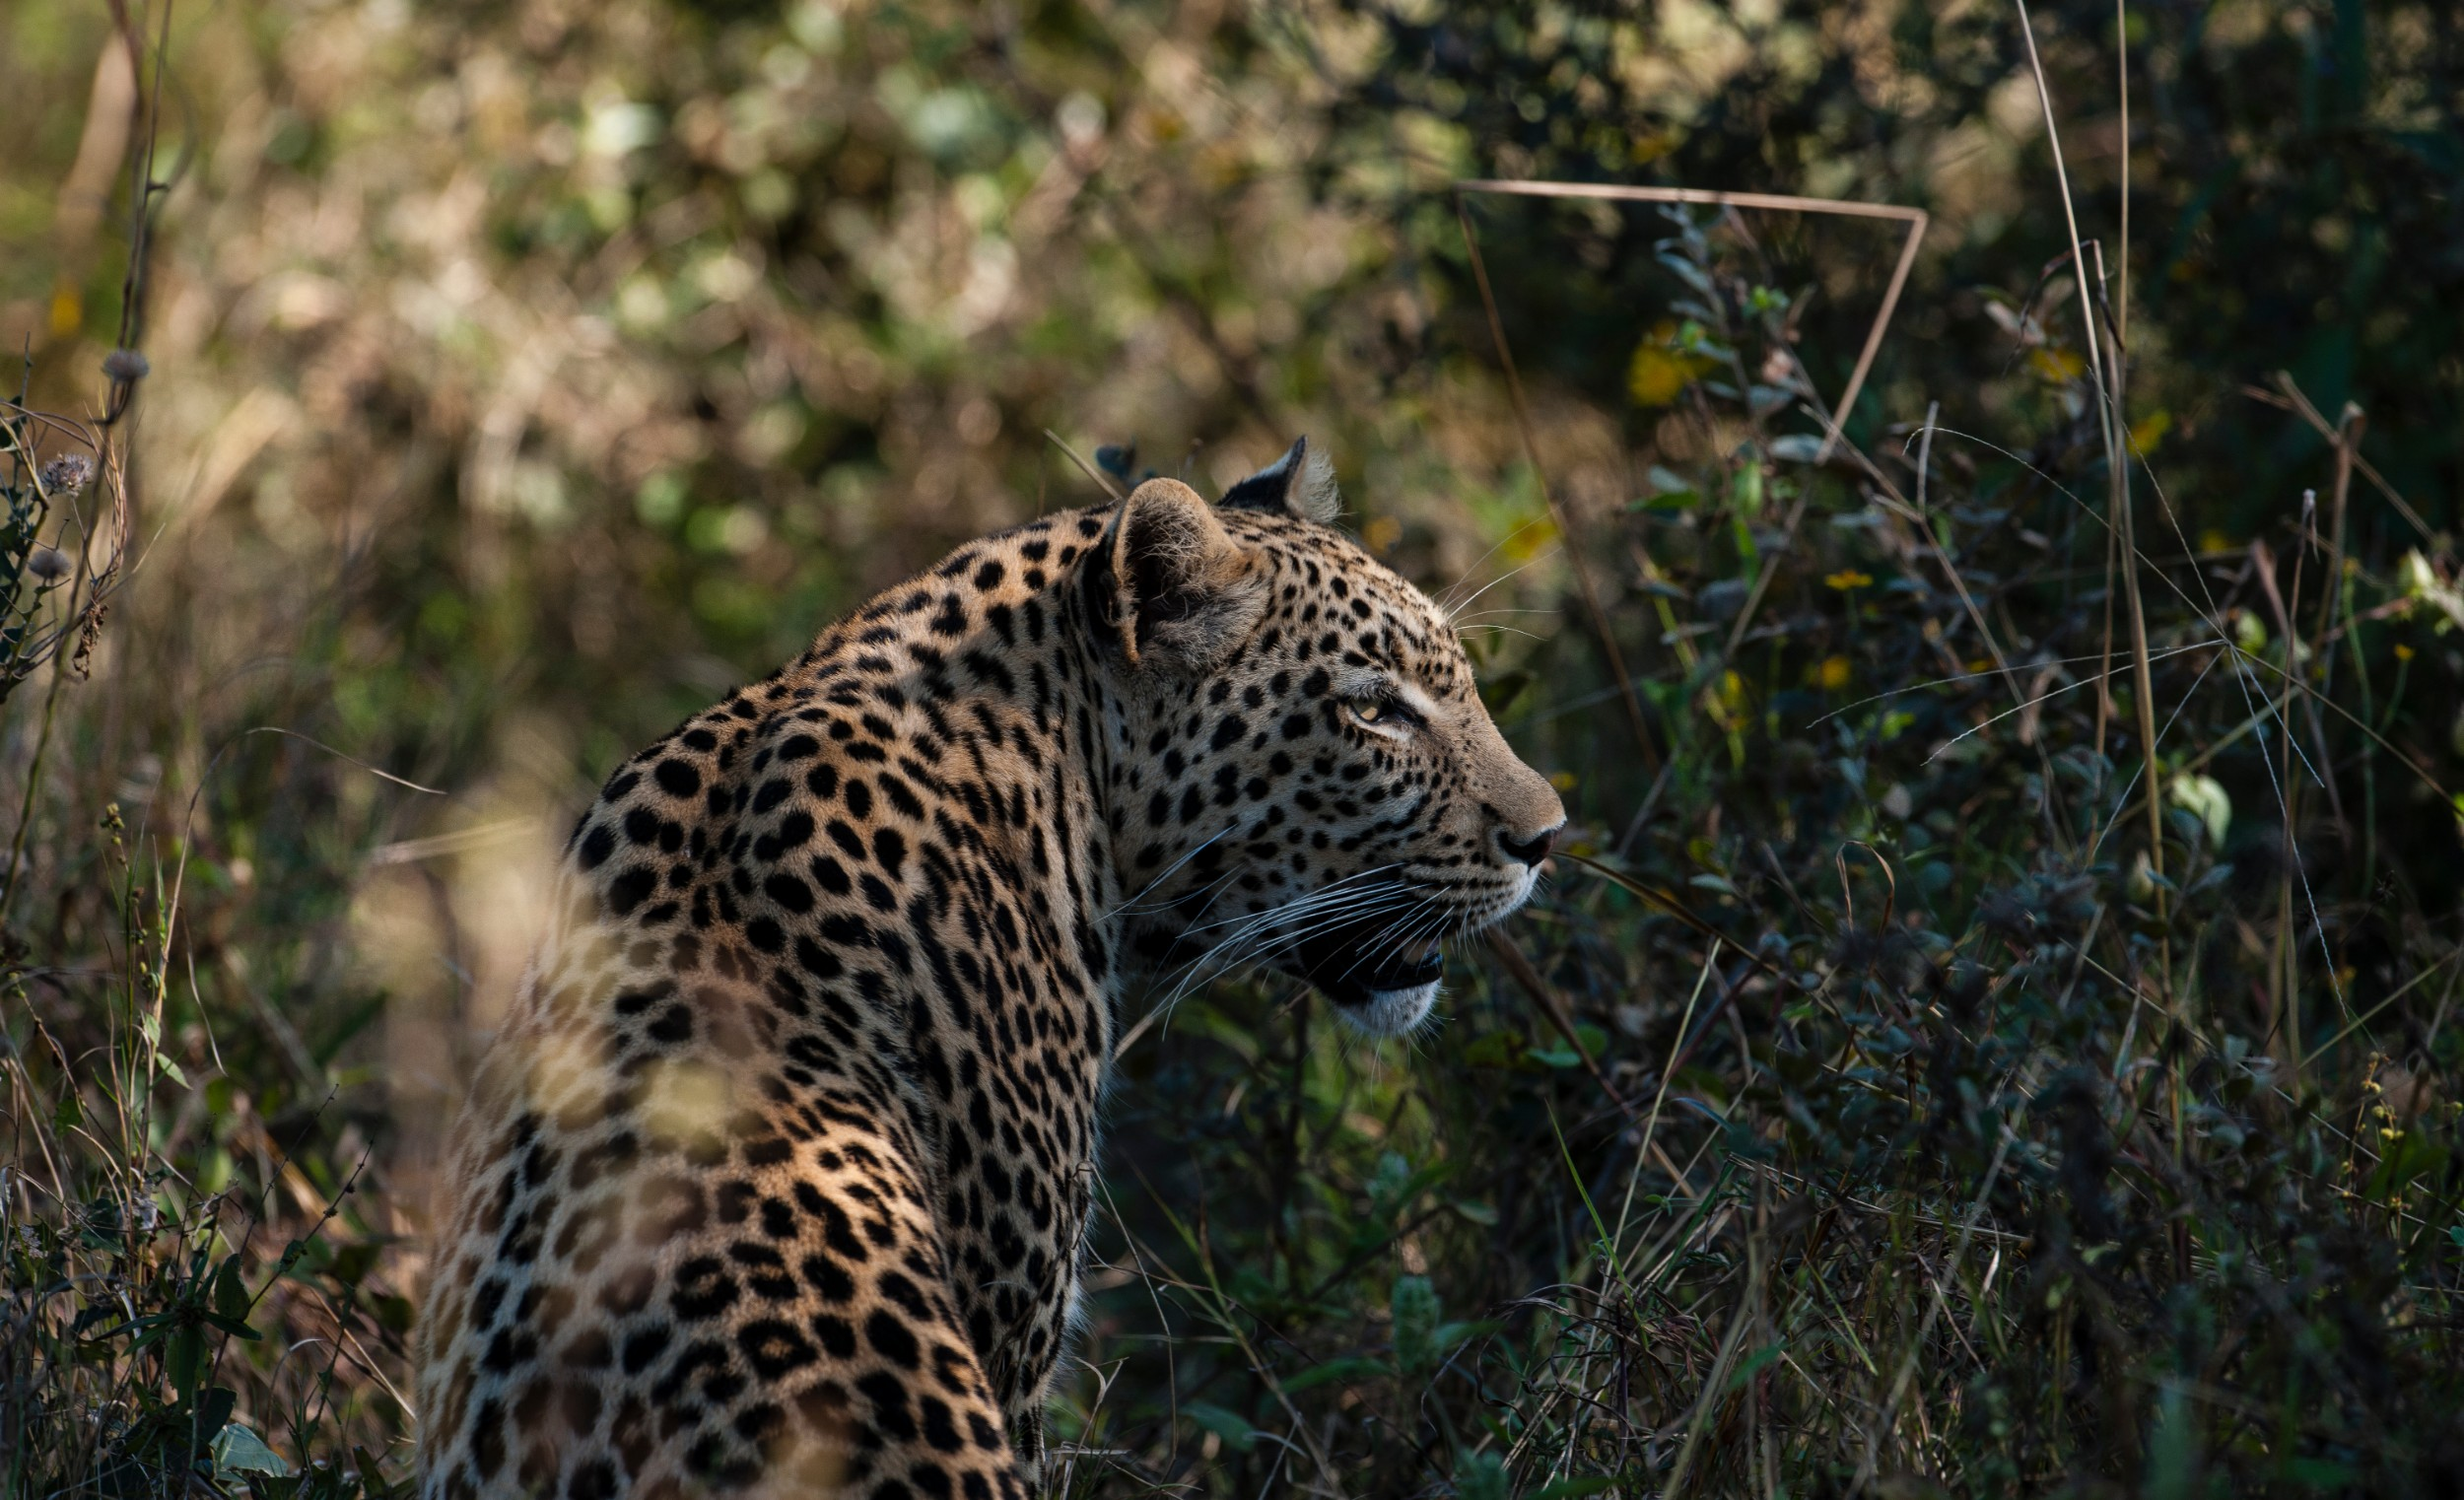 20The Jackal and Hide - Leopard.jpg